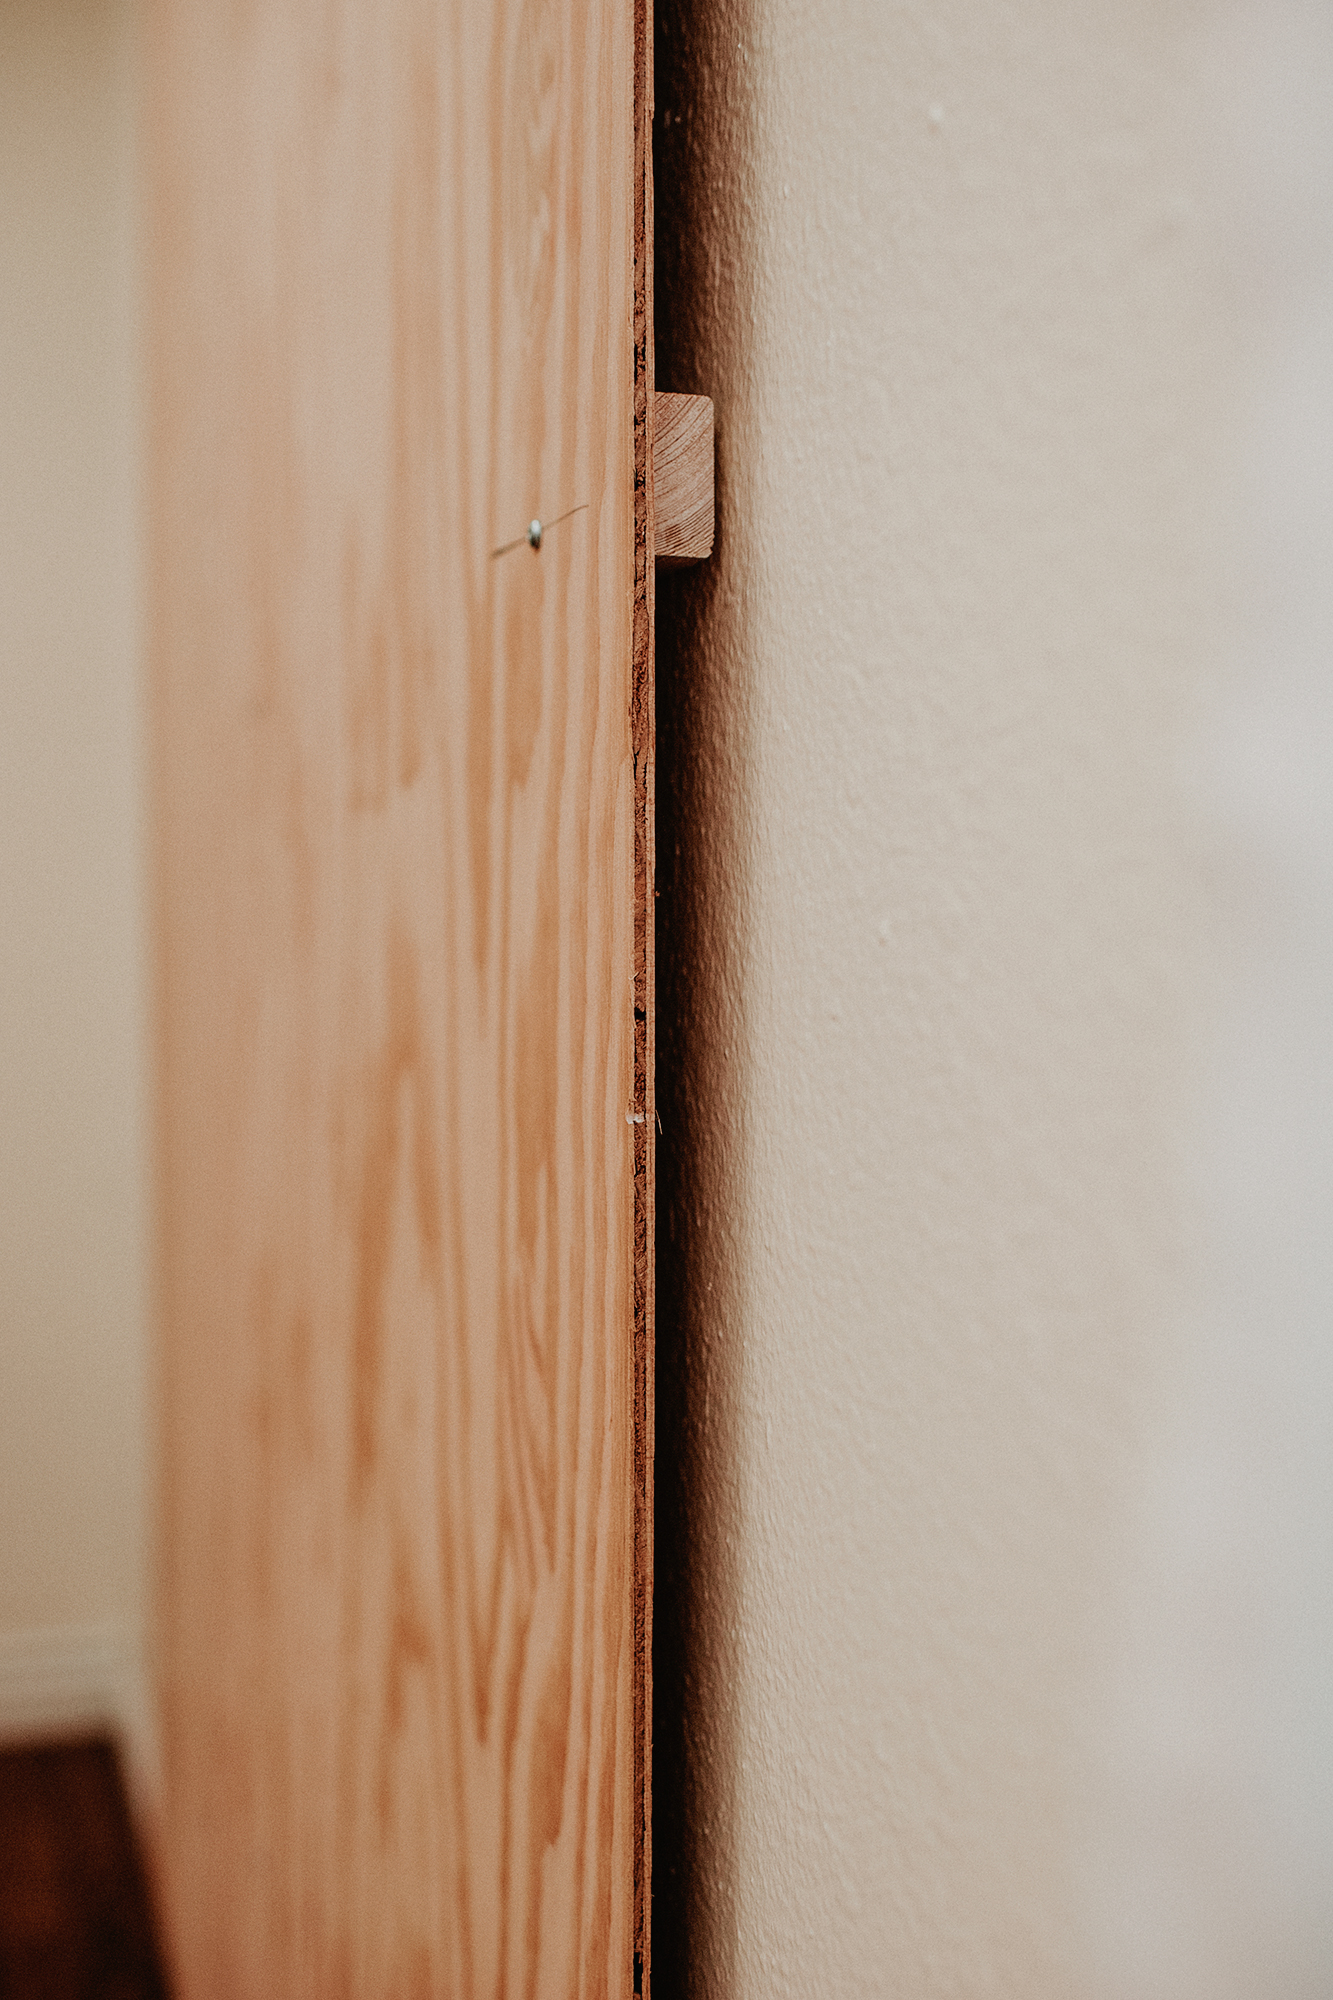 diy-corck-board-wall-furrying-strip.jpg